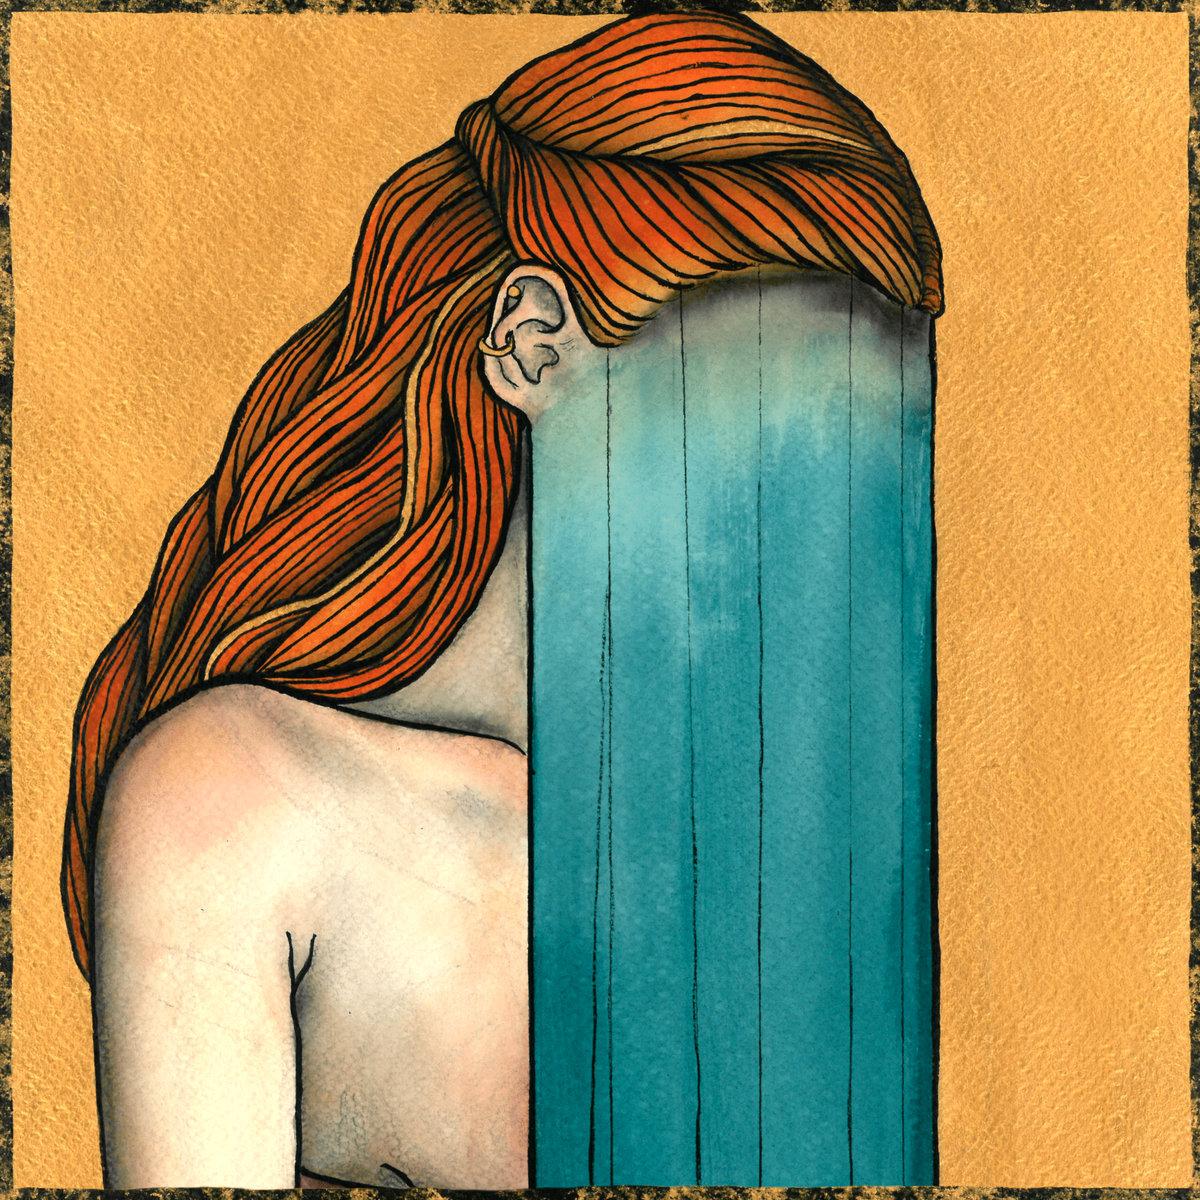 What's Left of the Sun - LIfeline [single] (2016)